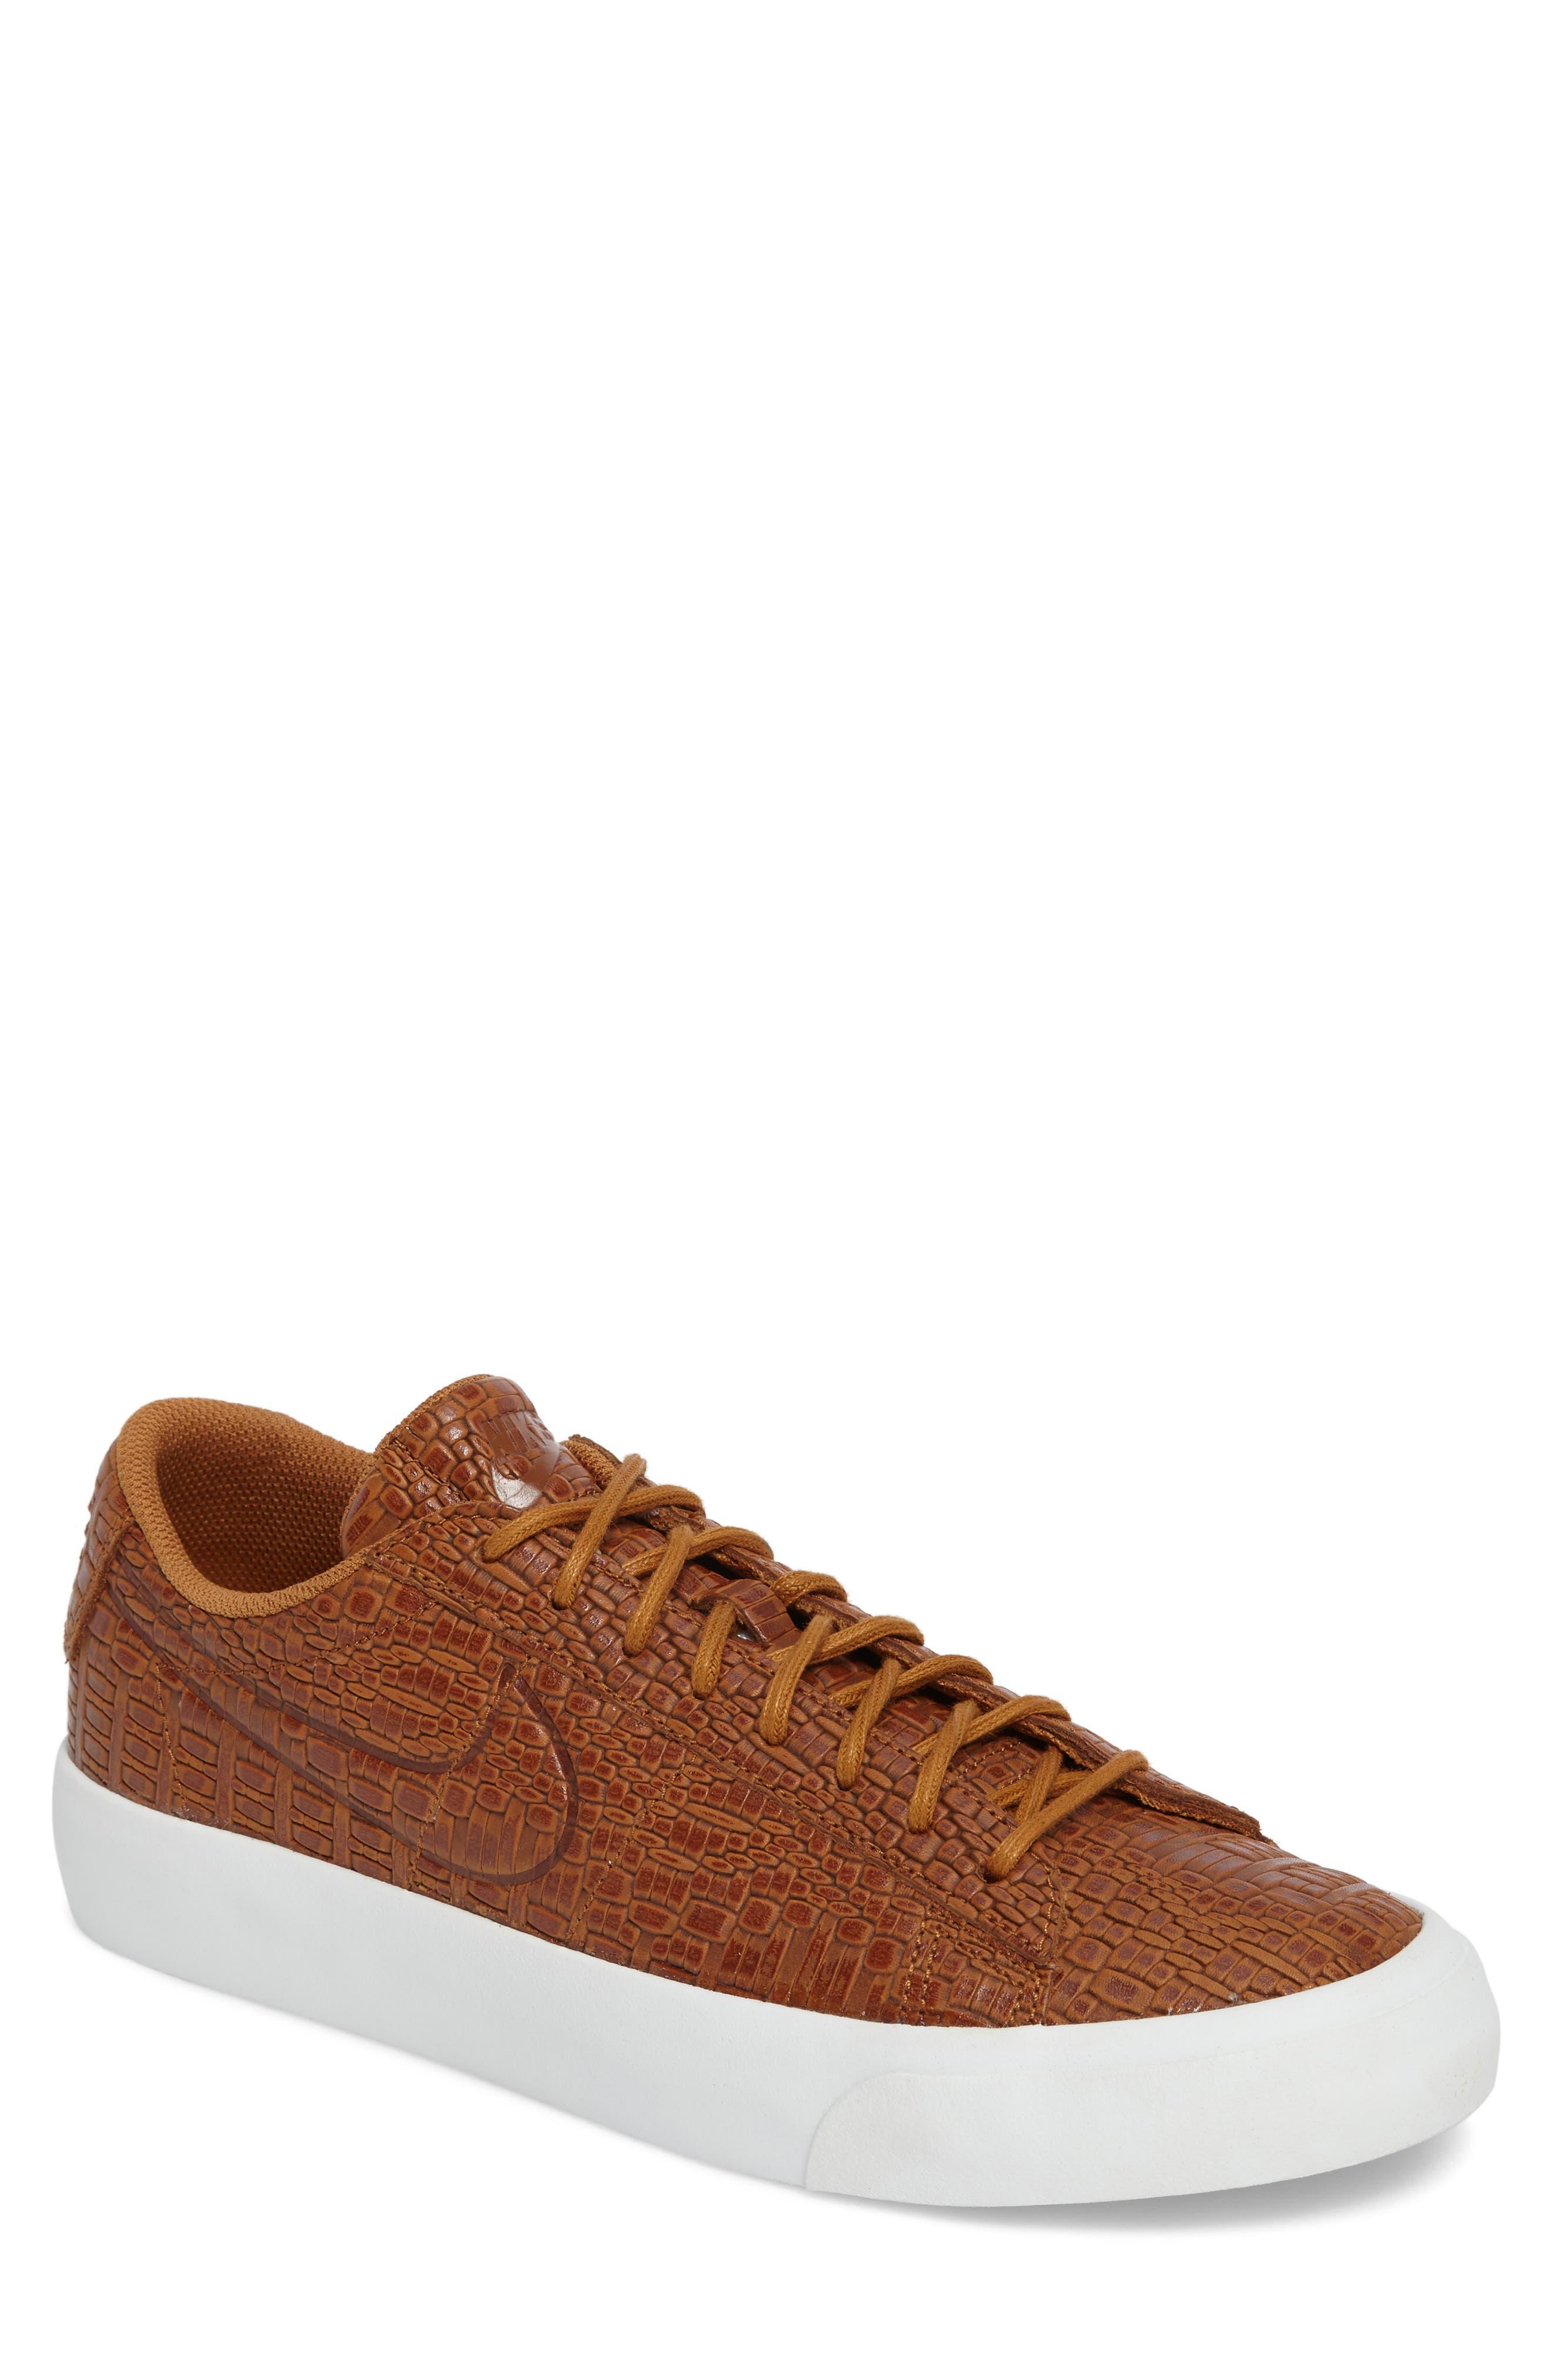 Alternate Image 1 Selected - Nike Blazer Studio Sneaker (Men)